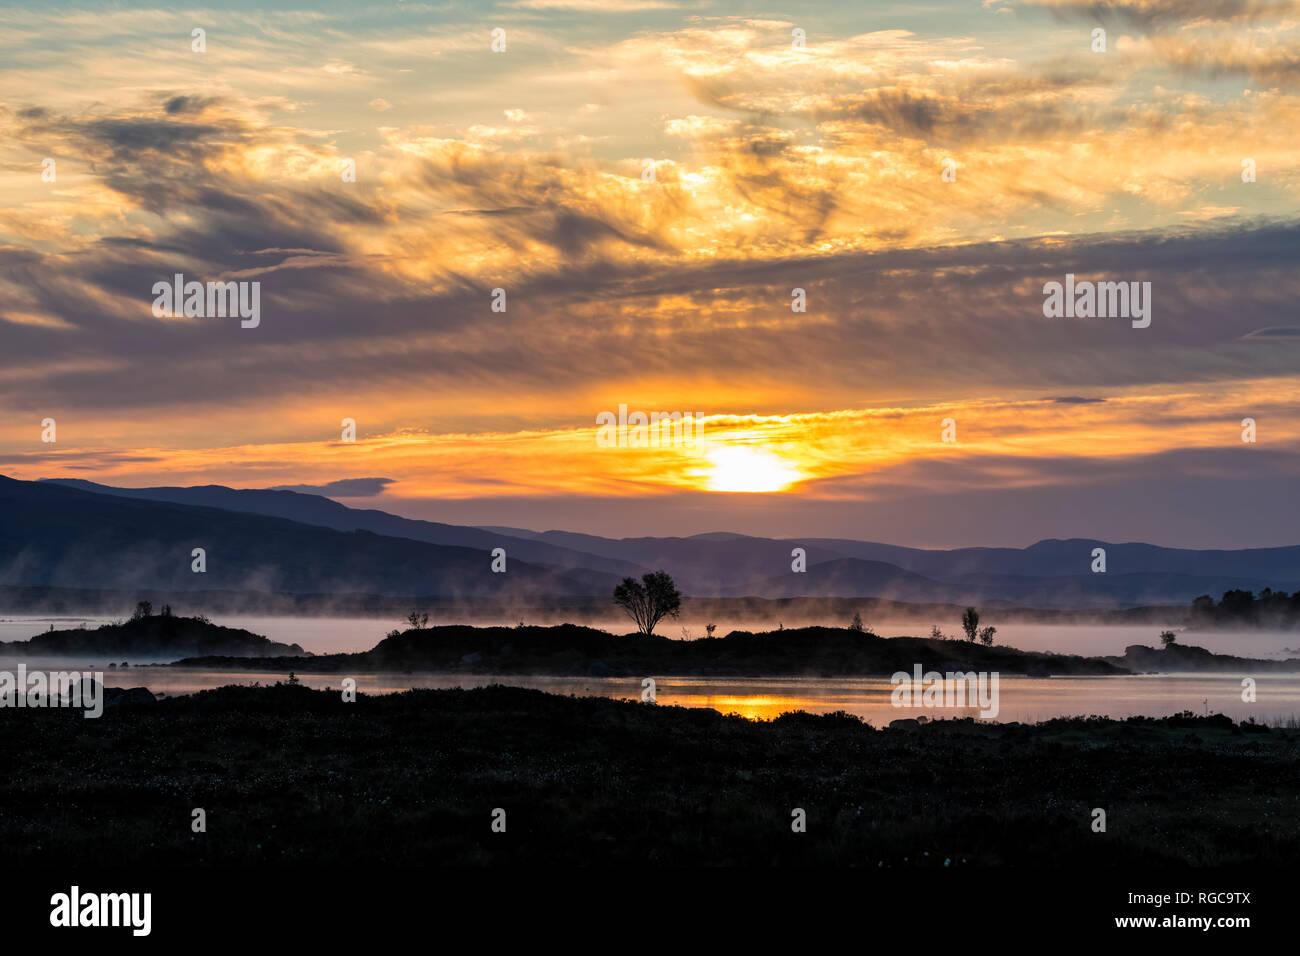 Great Britain, Scotland, Scottish Highlands, Glencoe, Rannoch Moor, Sunrise over Loch Ba - Stock Image